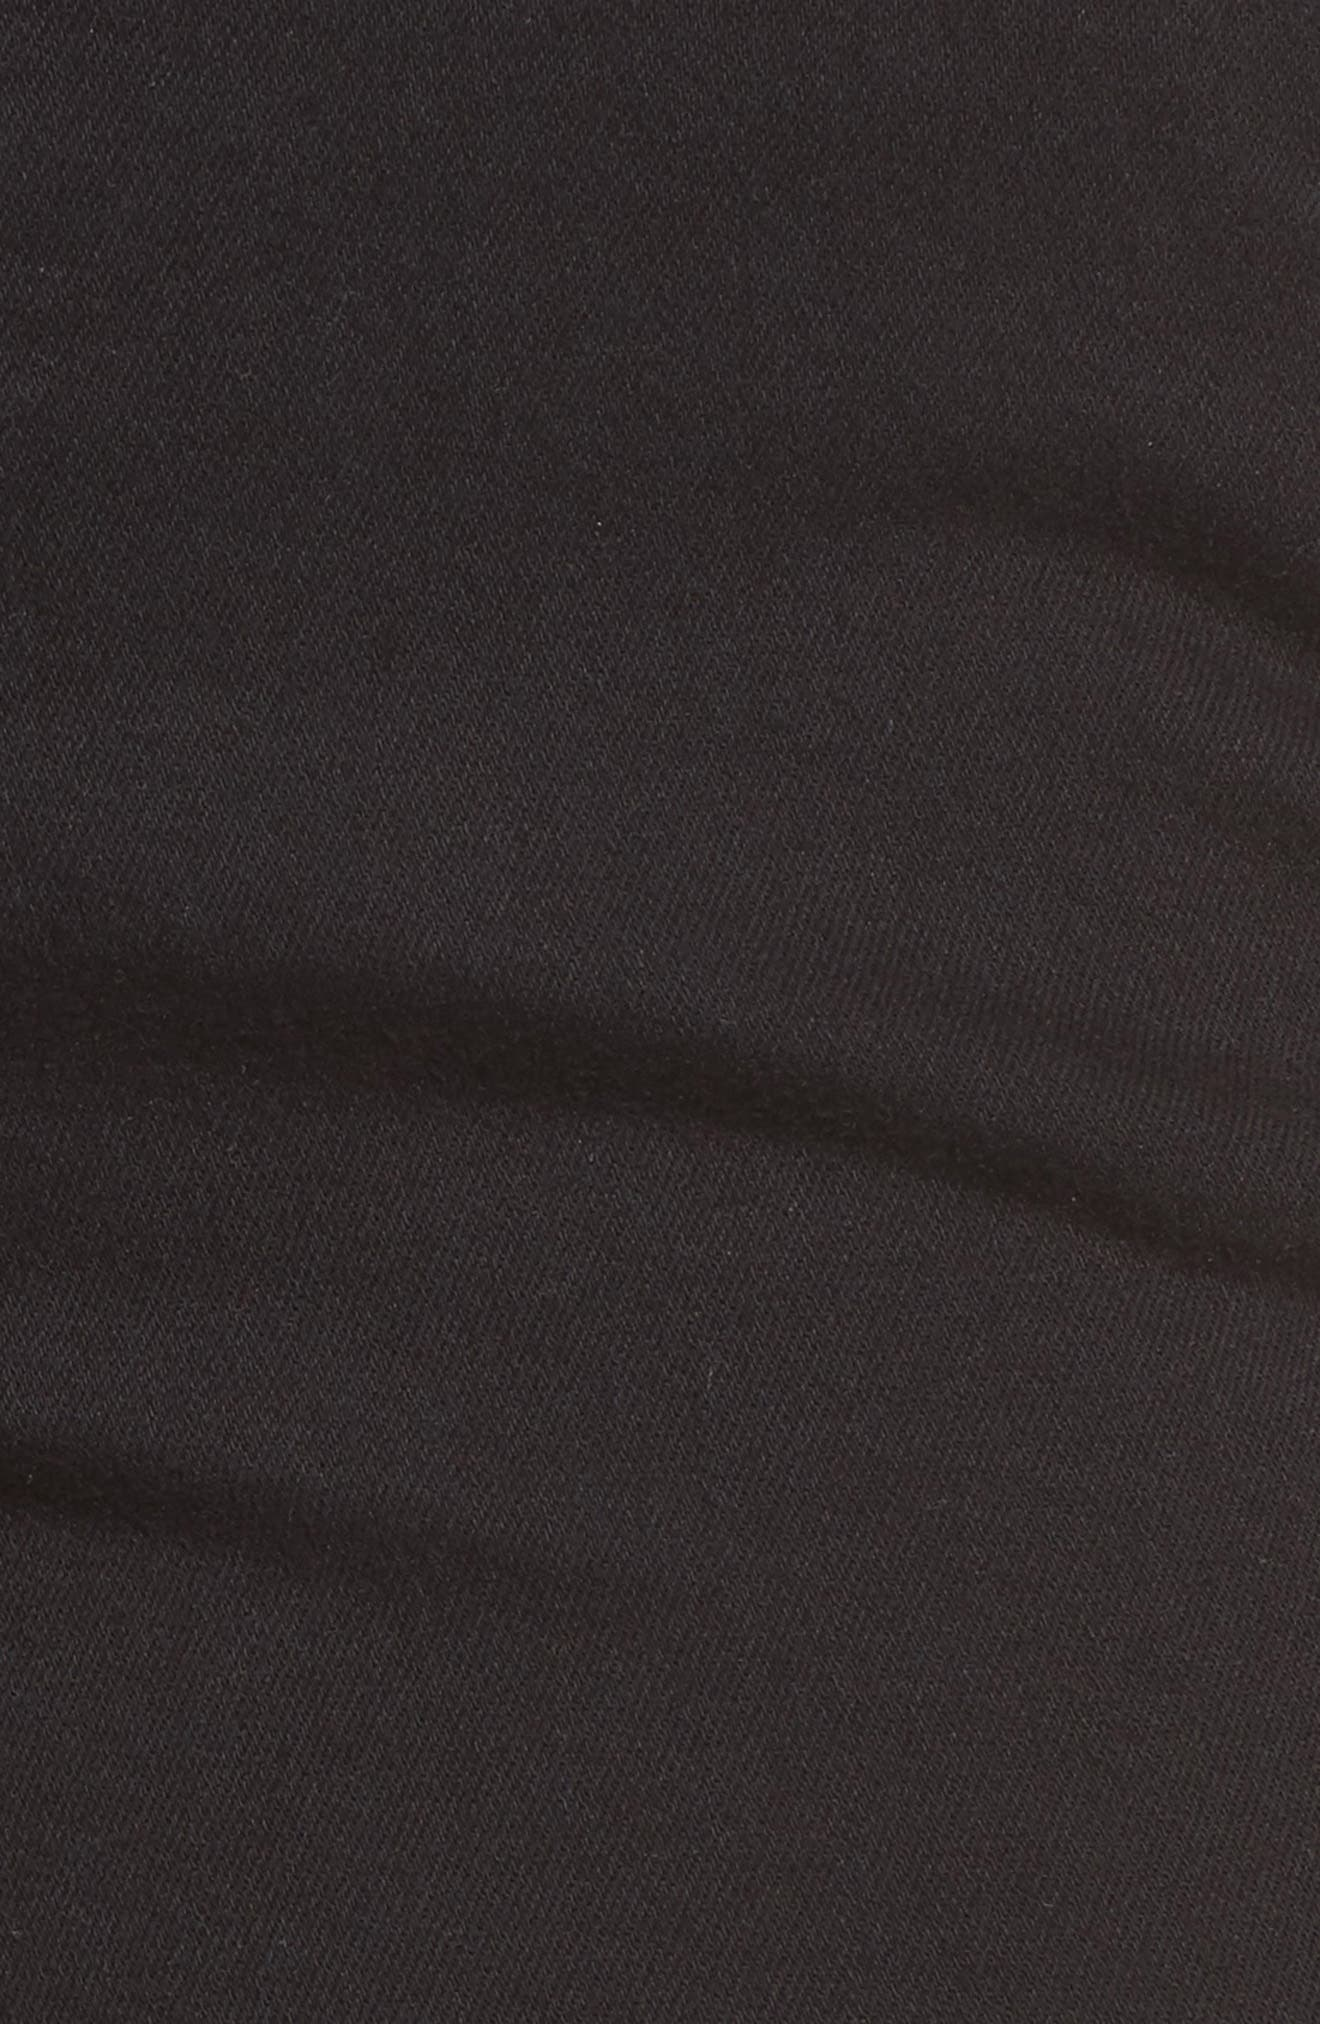 Juliette Skinny Cargo Pants,                             Alternate thumbnail 5, color,                             001